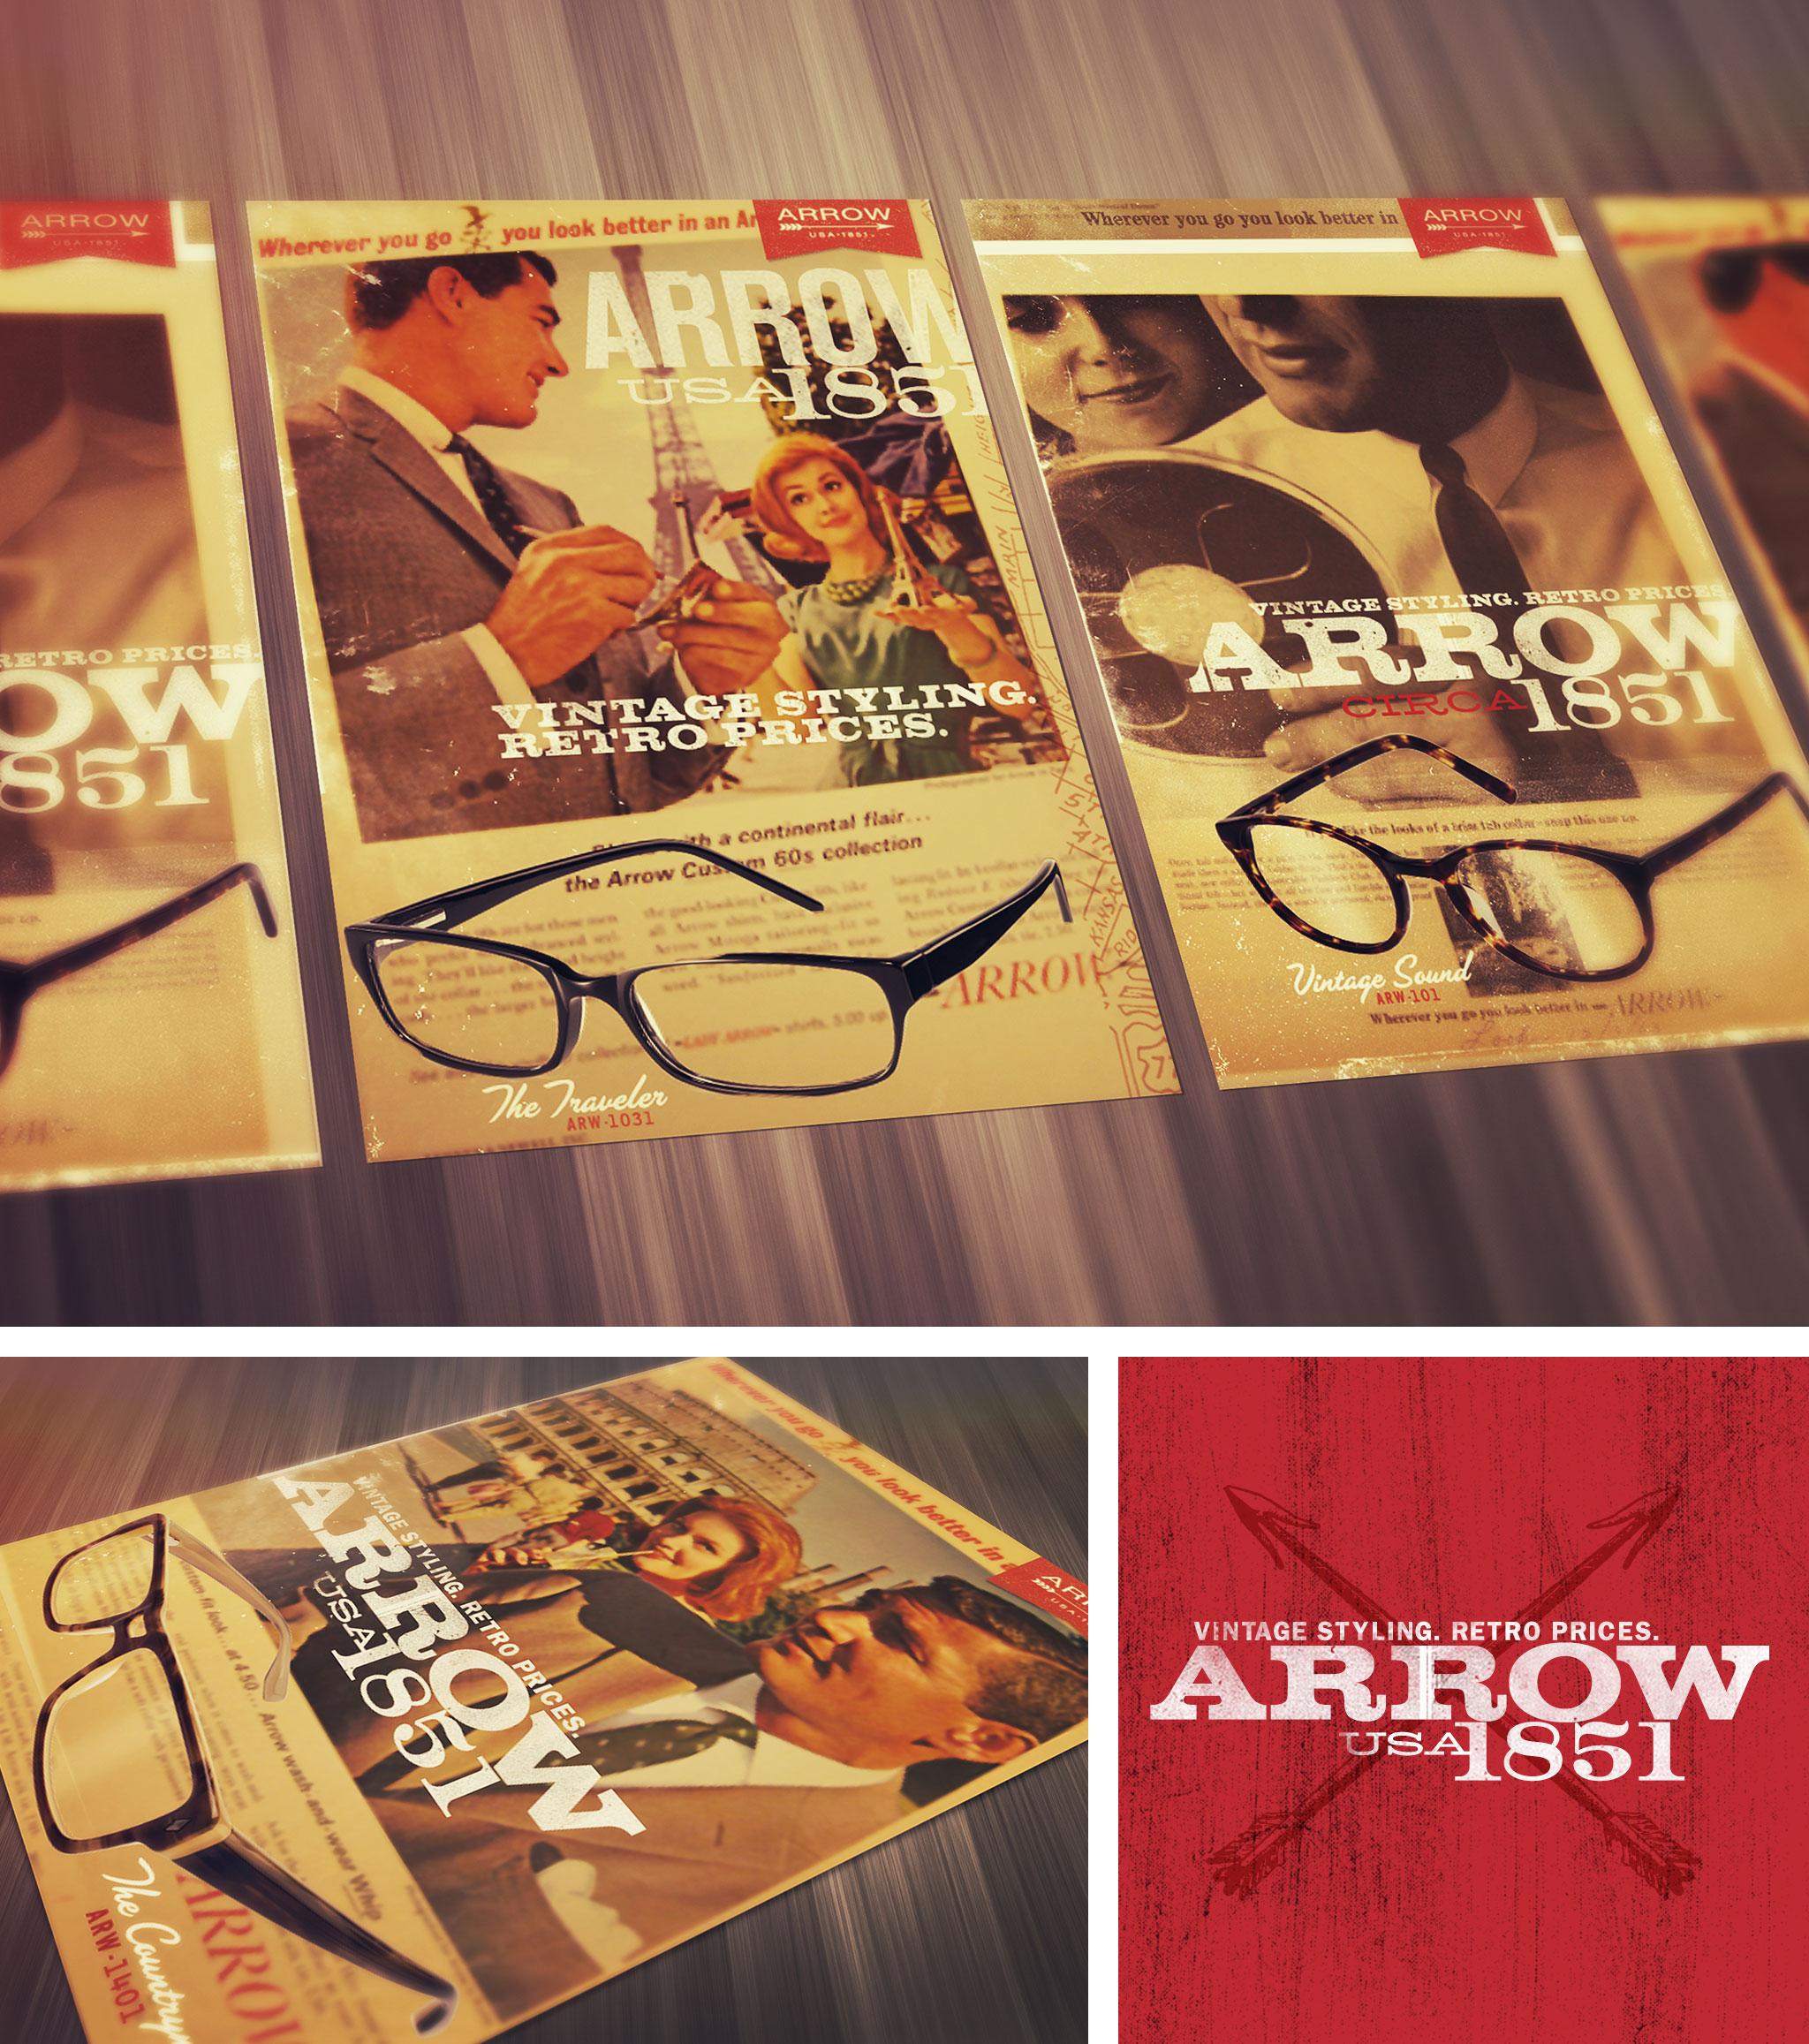 work_advert_arrow-2